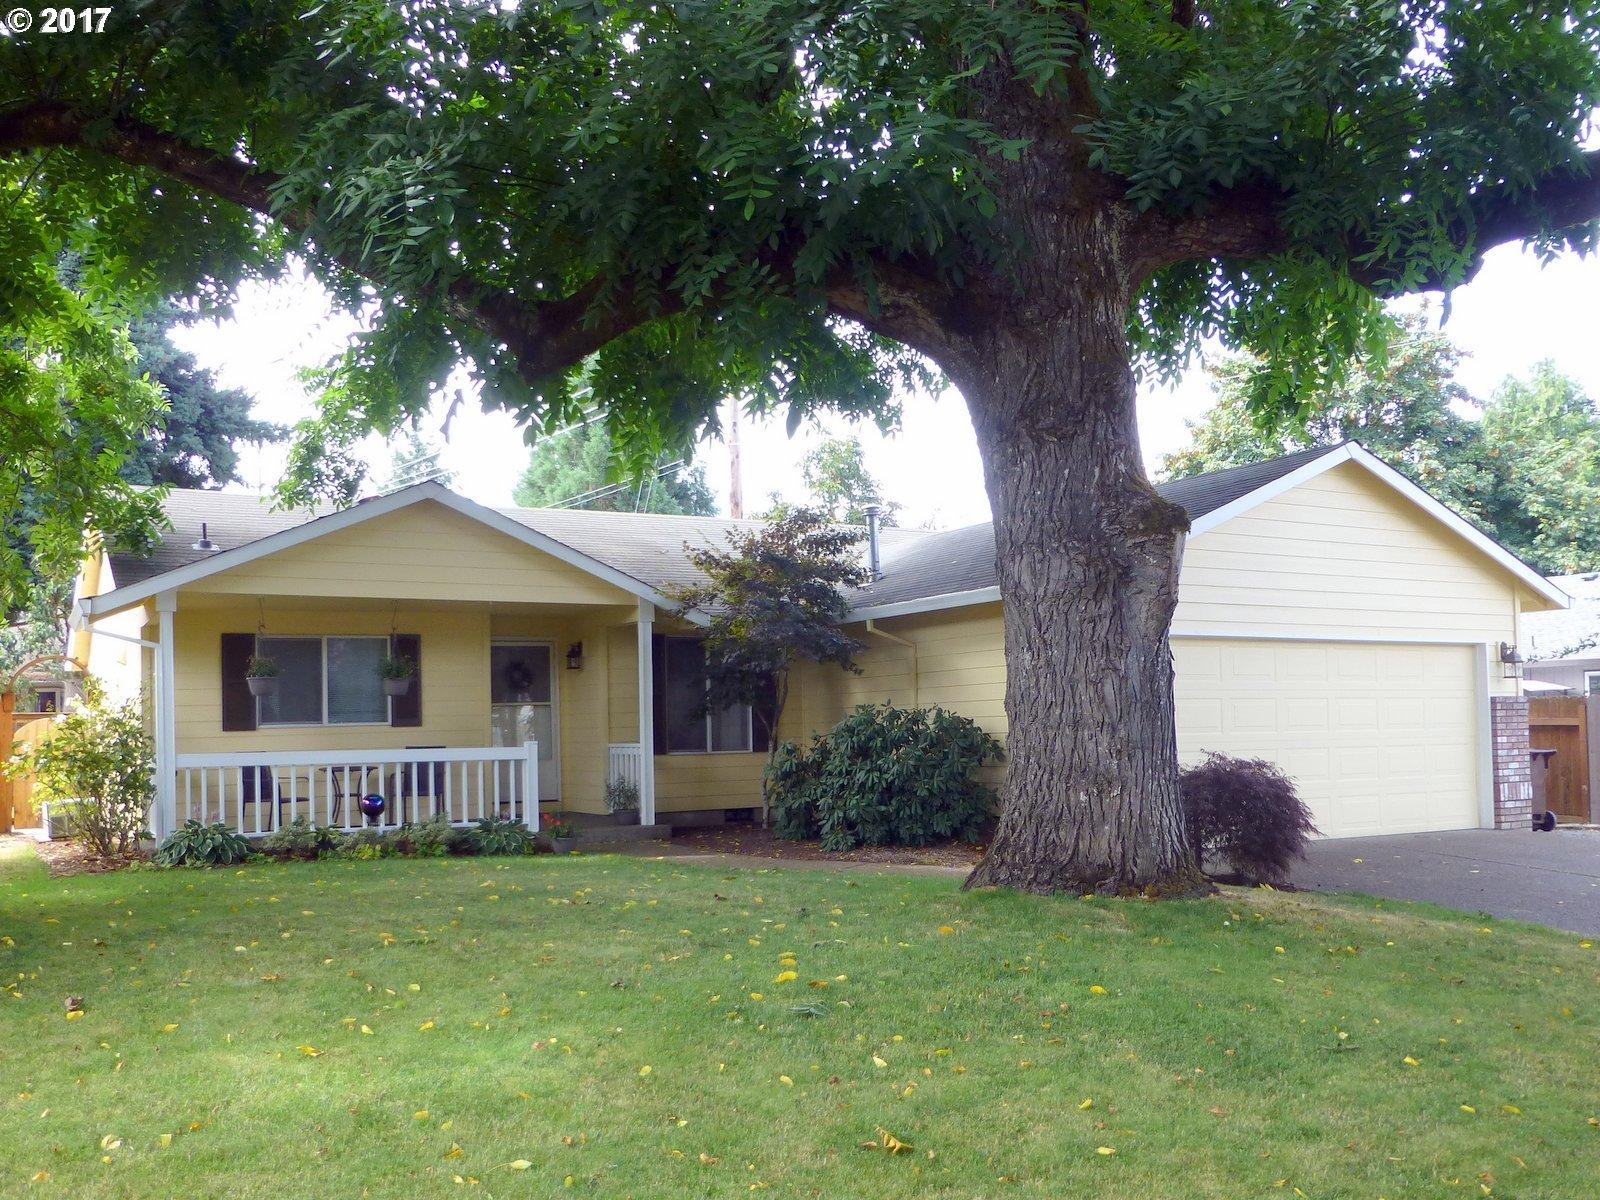 922 HALEY CT, Oregon City, OR 97045